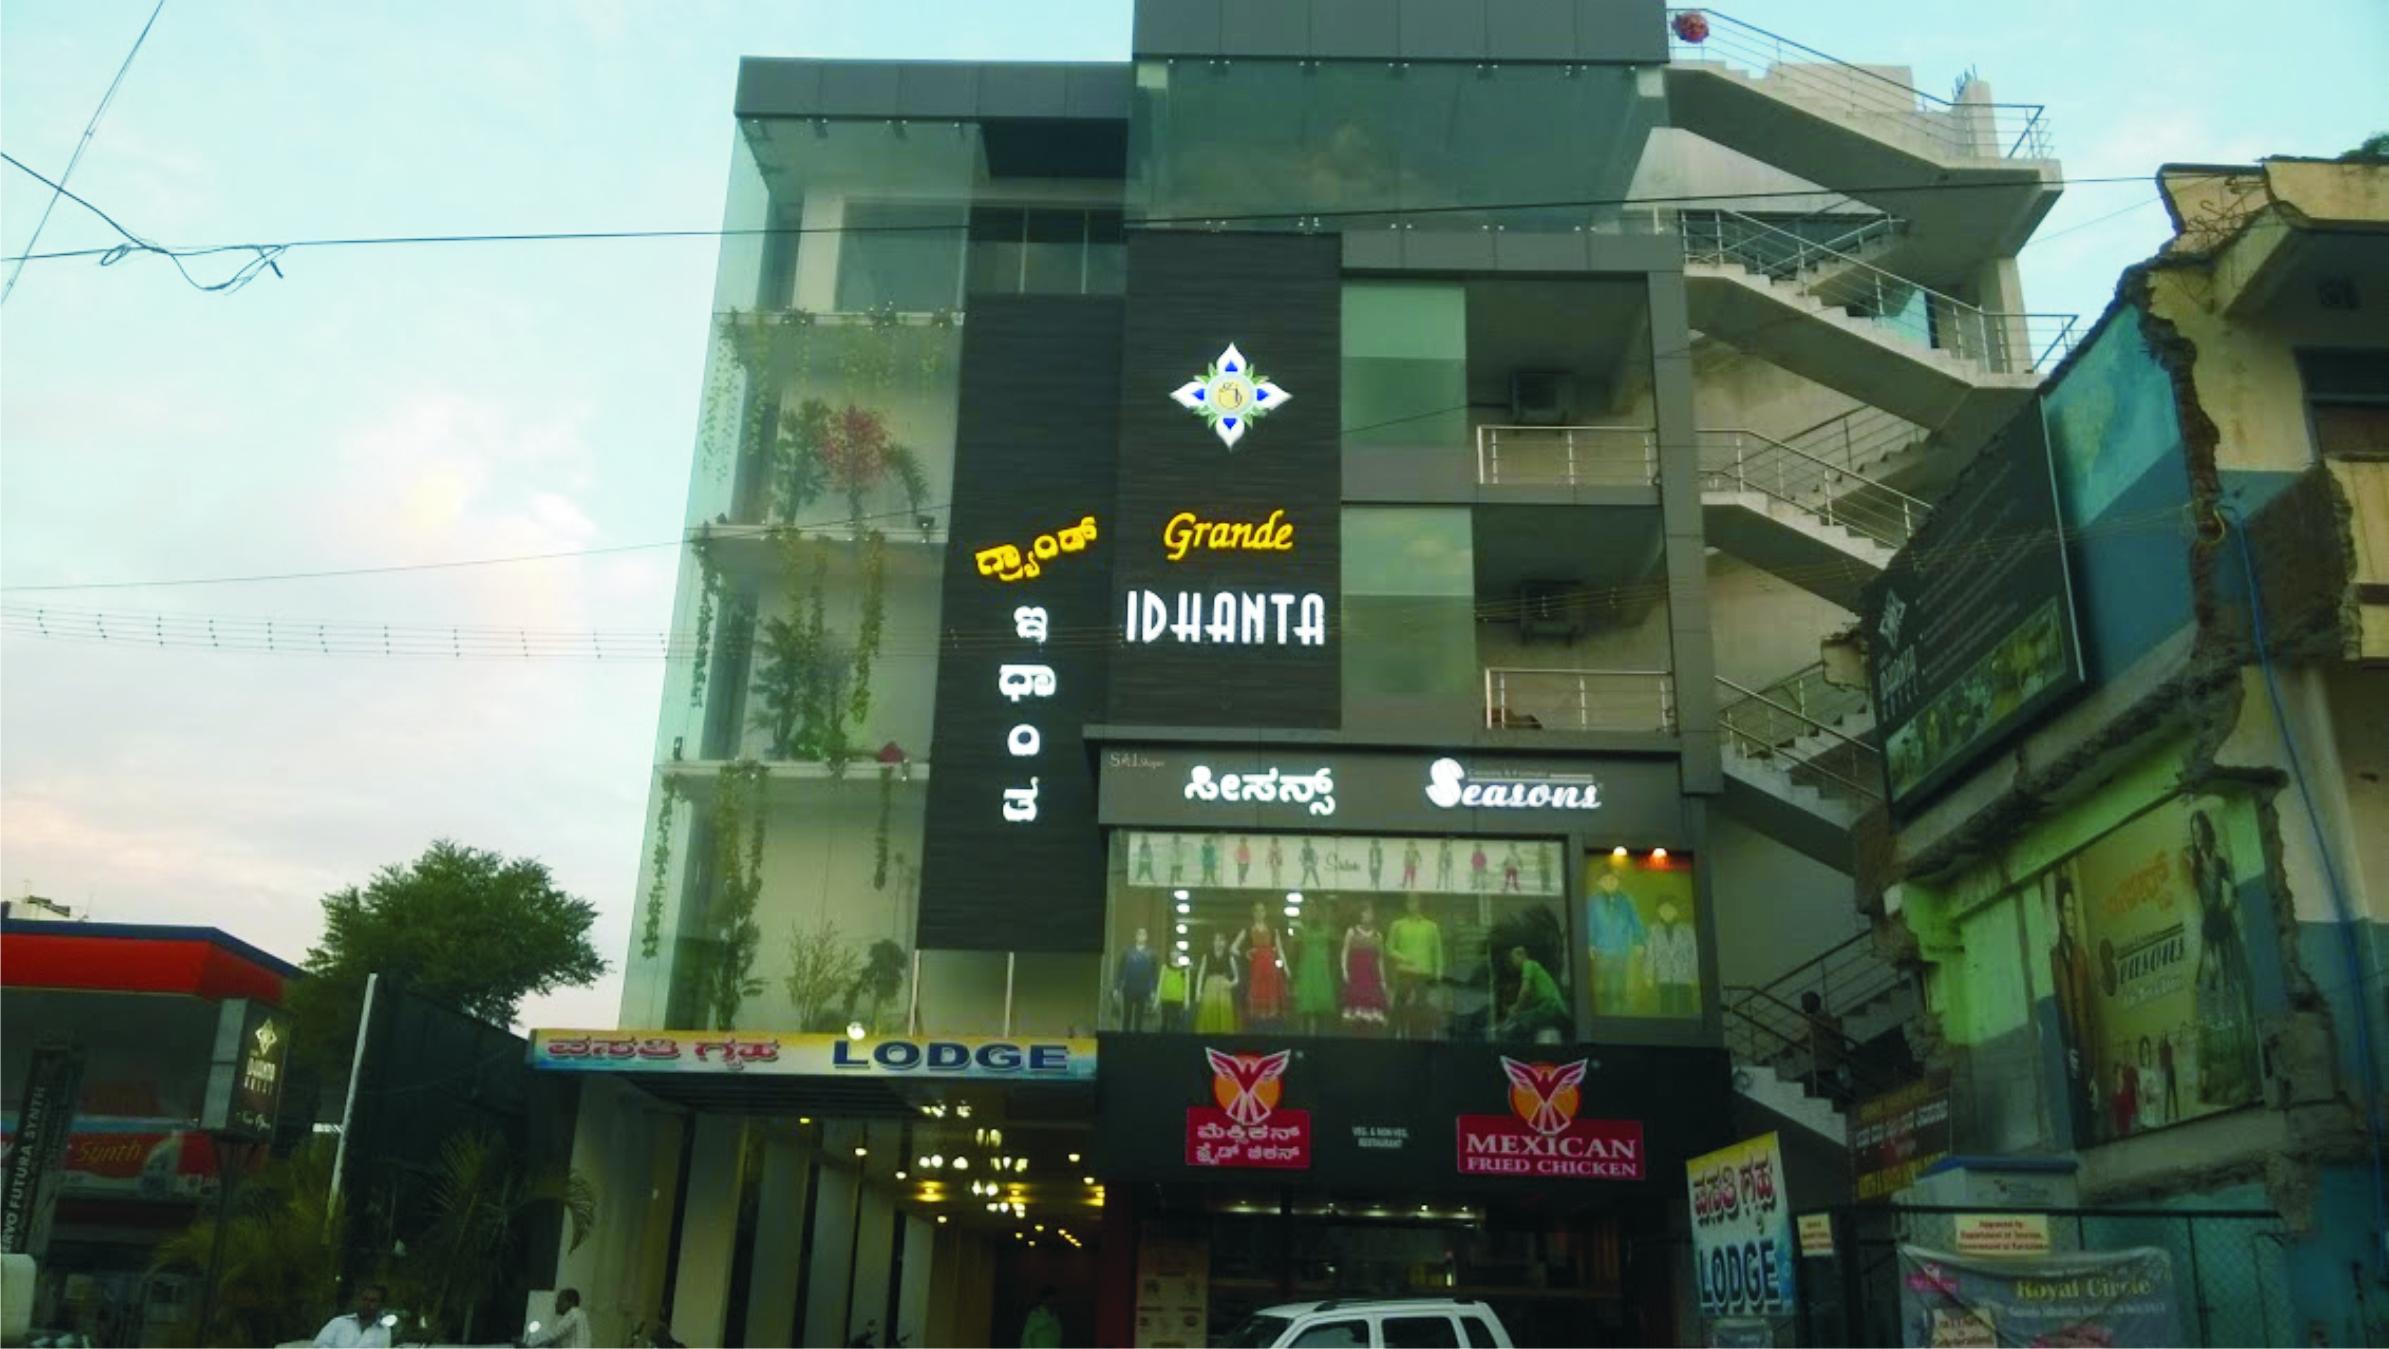 Grande Idhanta Hotel